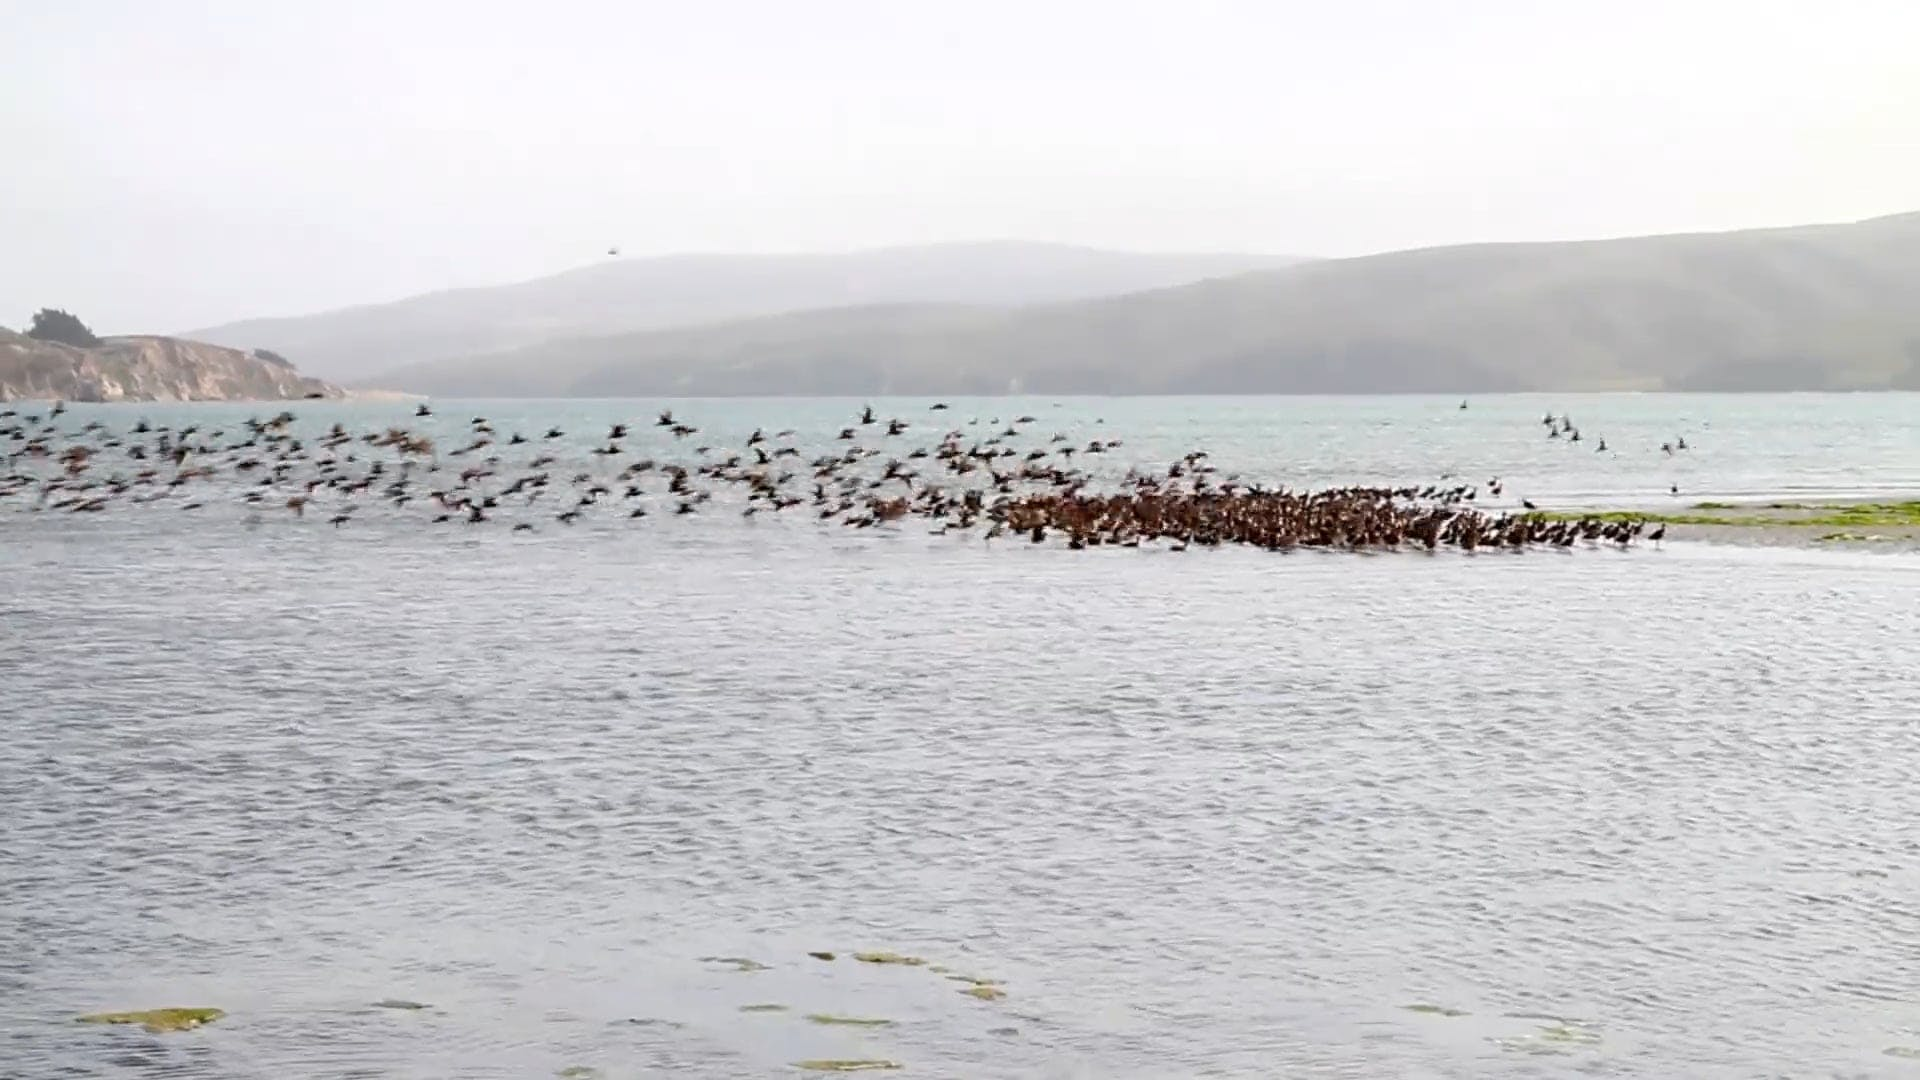 Flock of Birds in the Sea